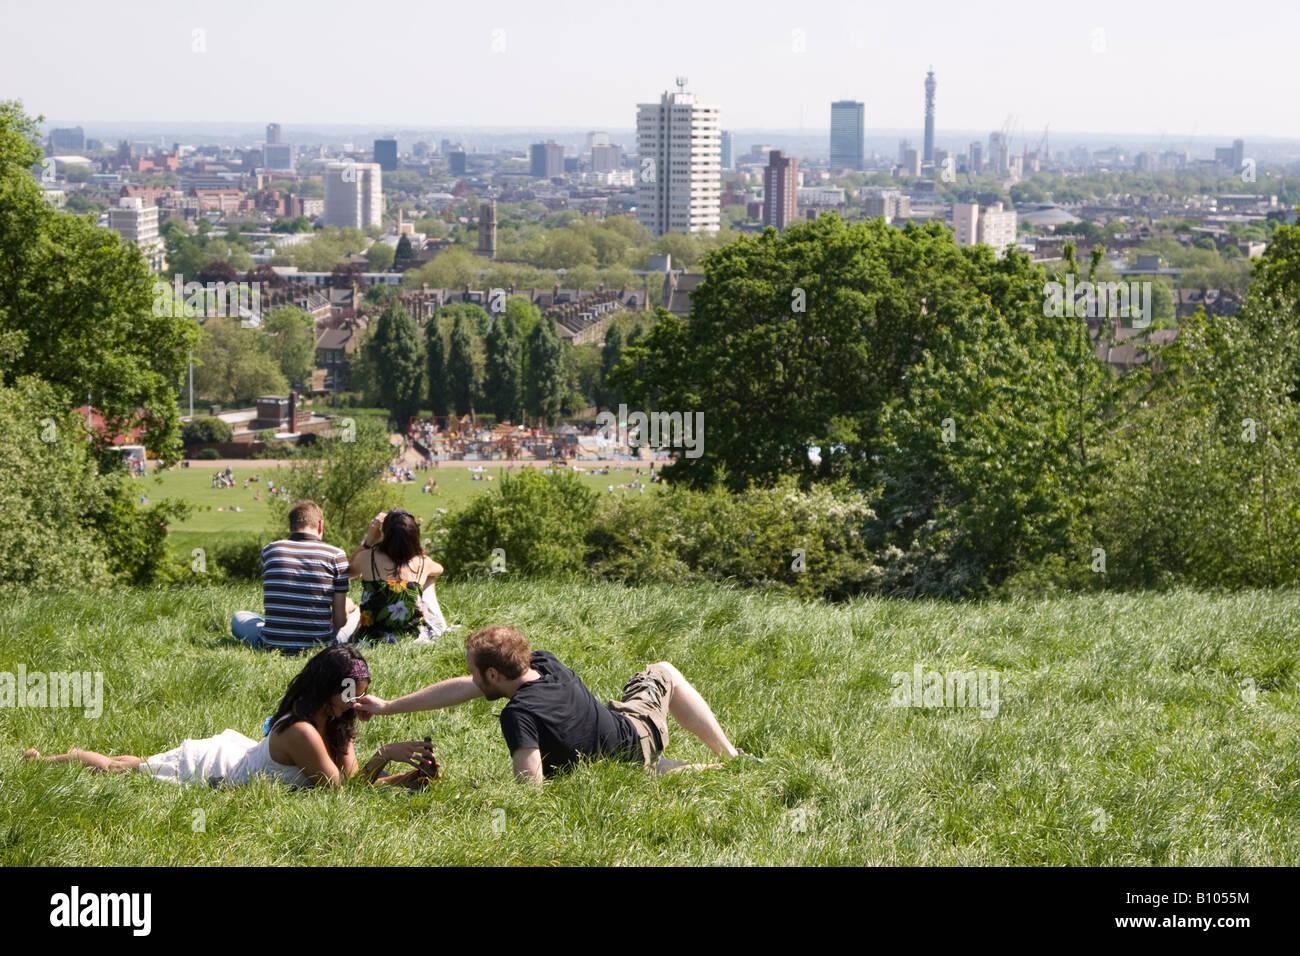 Parliament Hill - Hampstead Heath - Camden - London - Stock Image